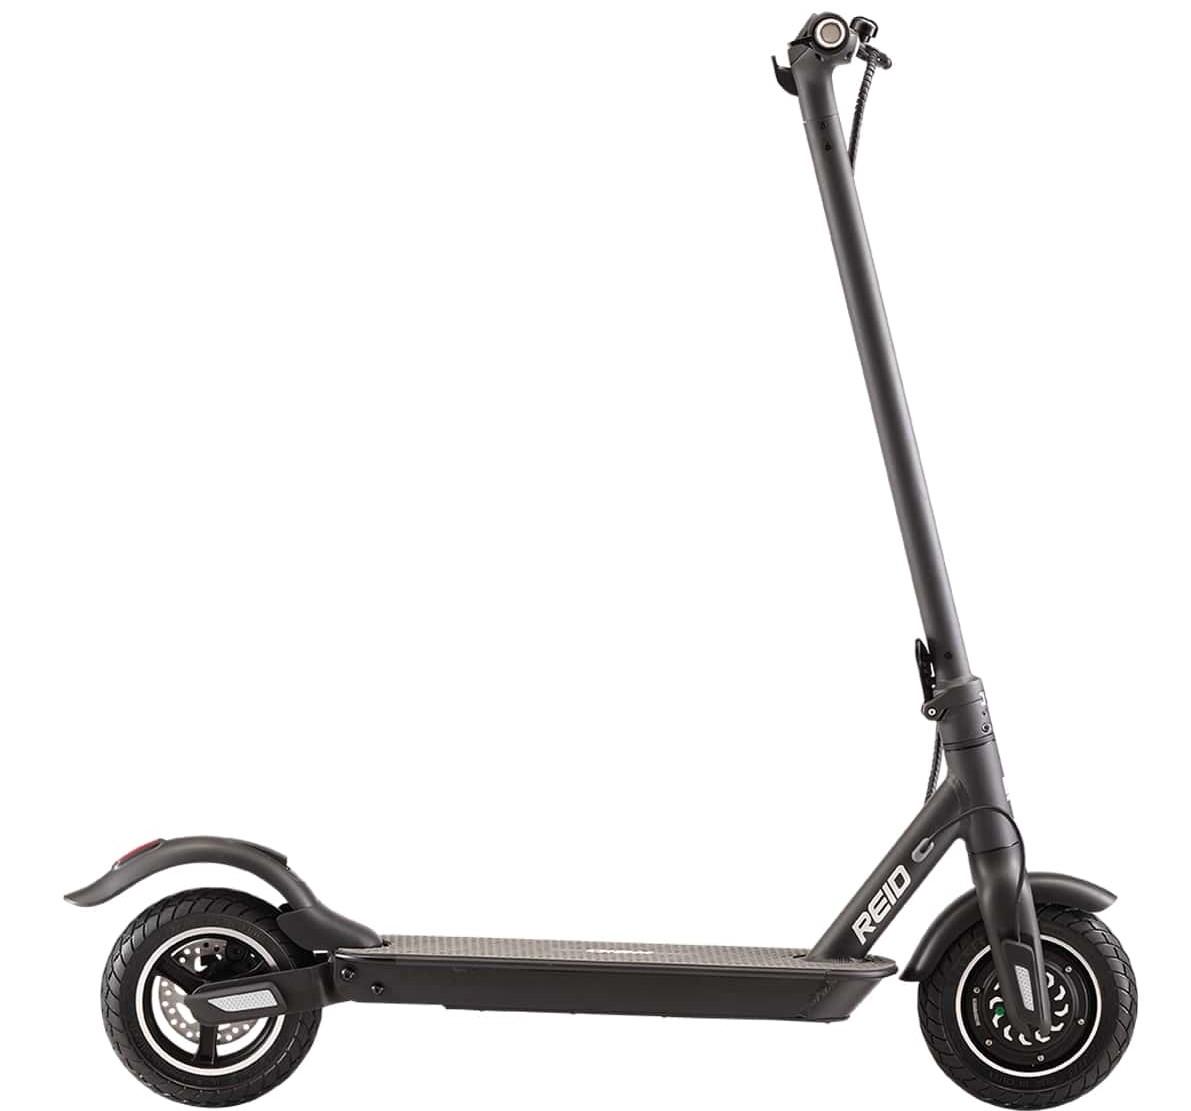 Reid E4 Plus scooter